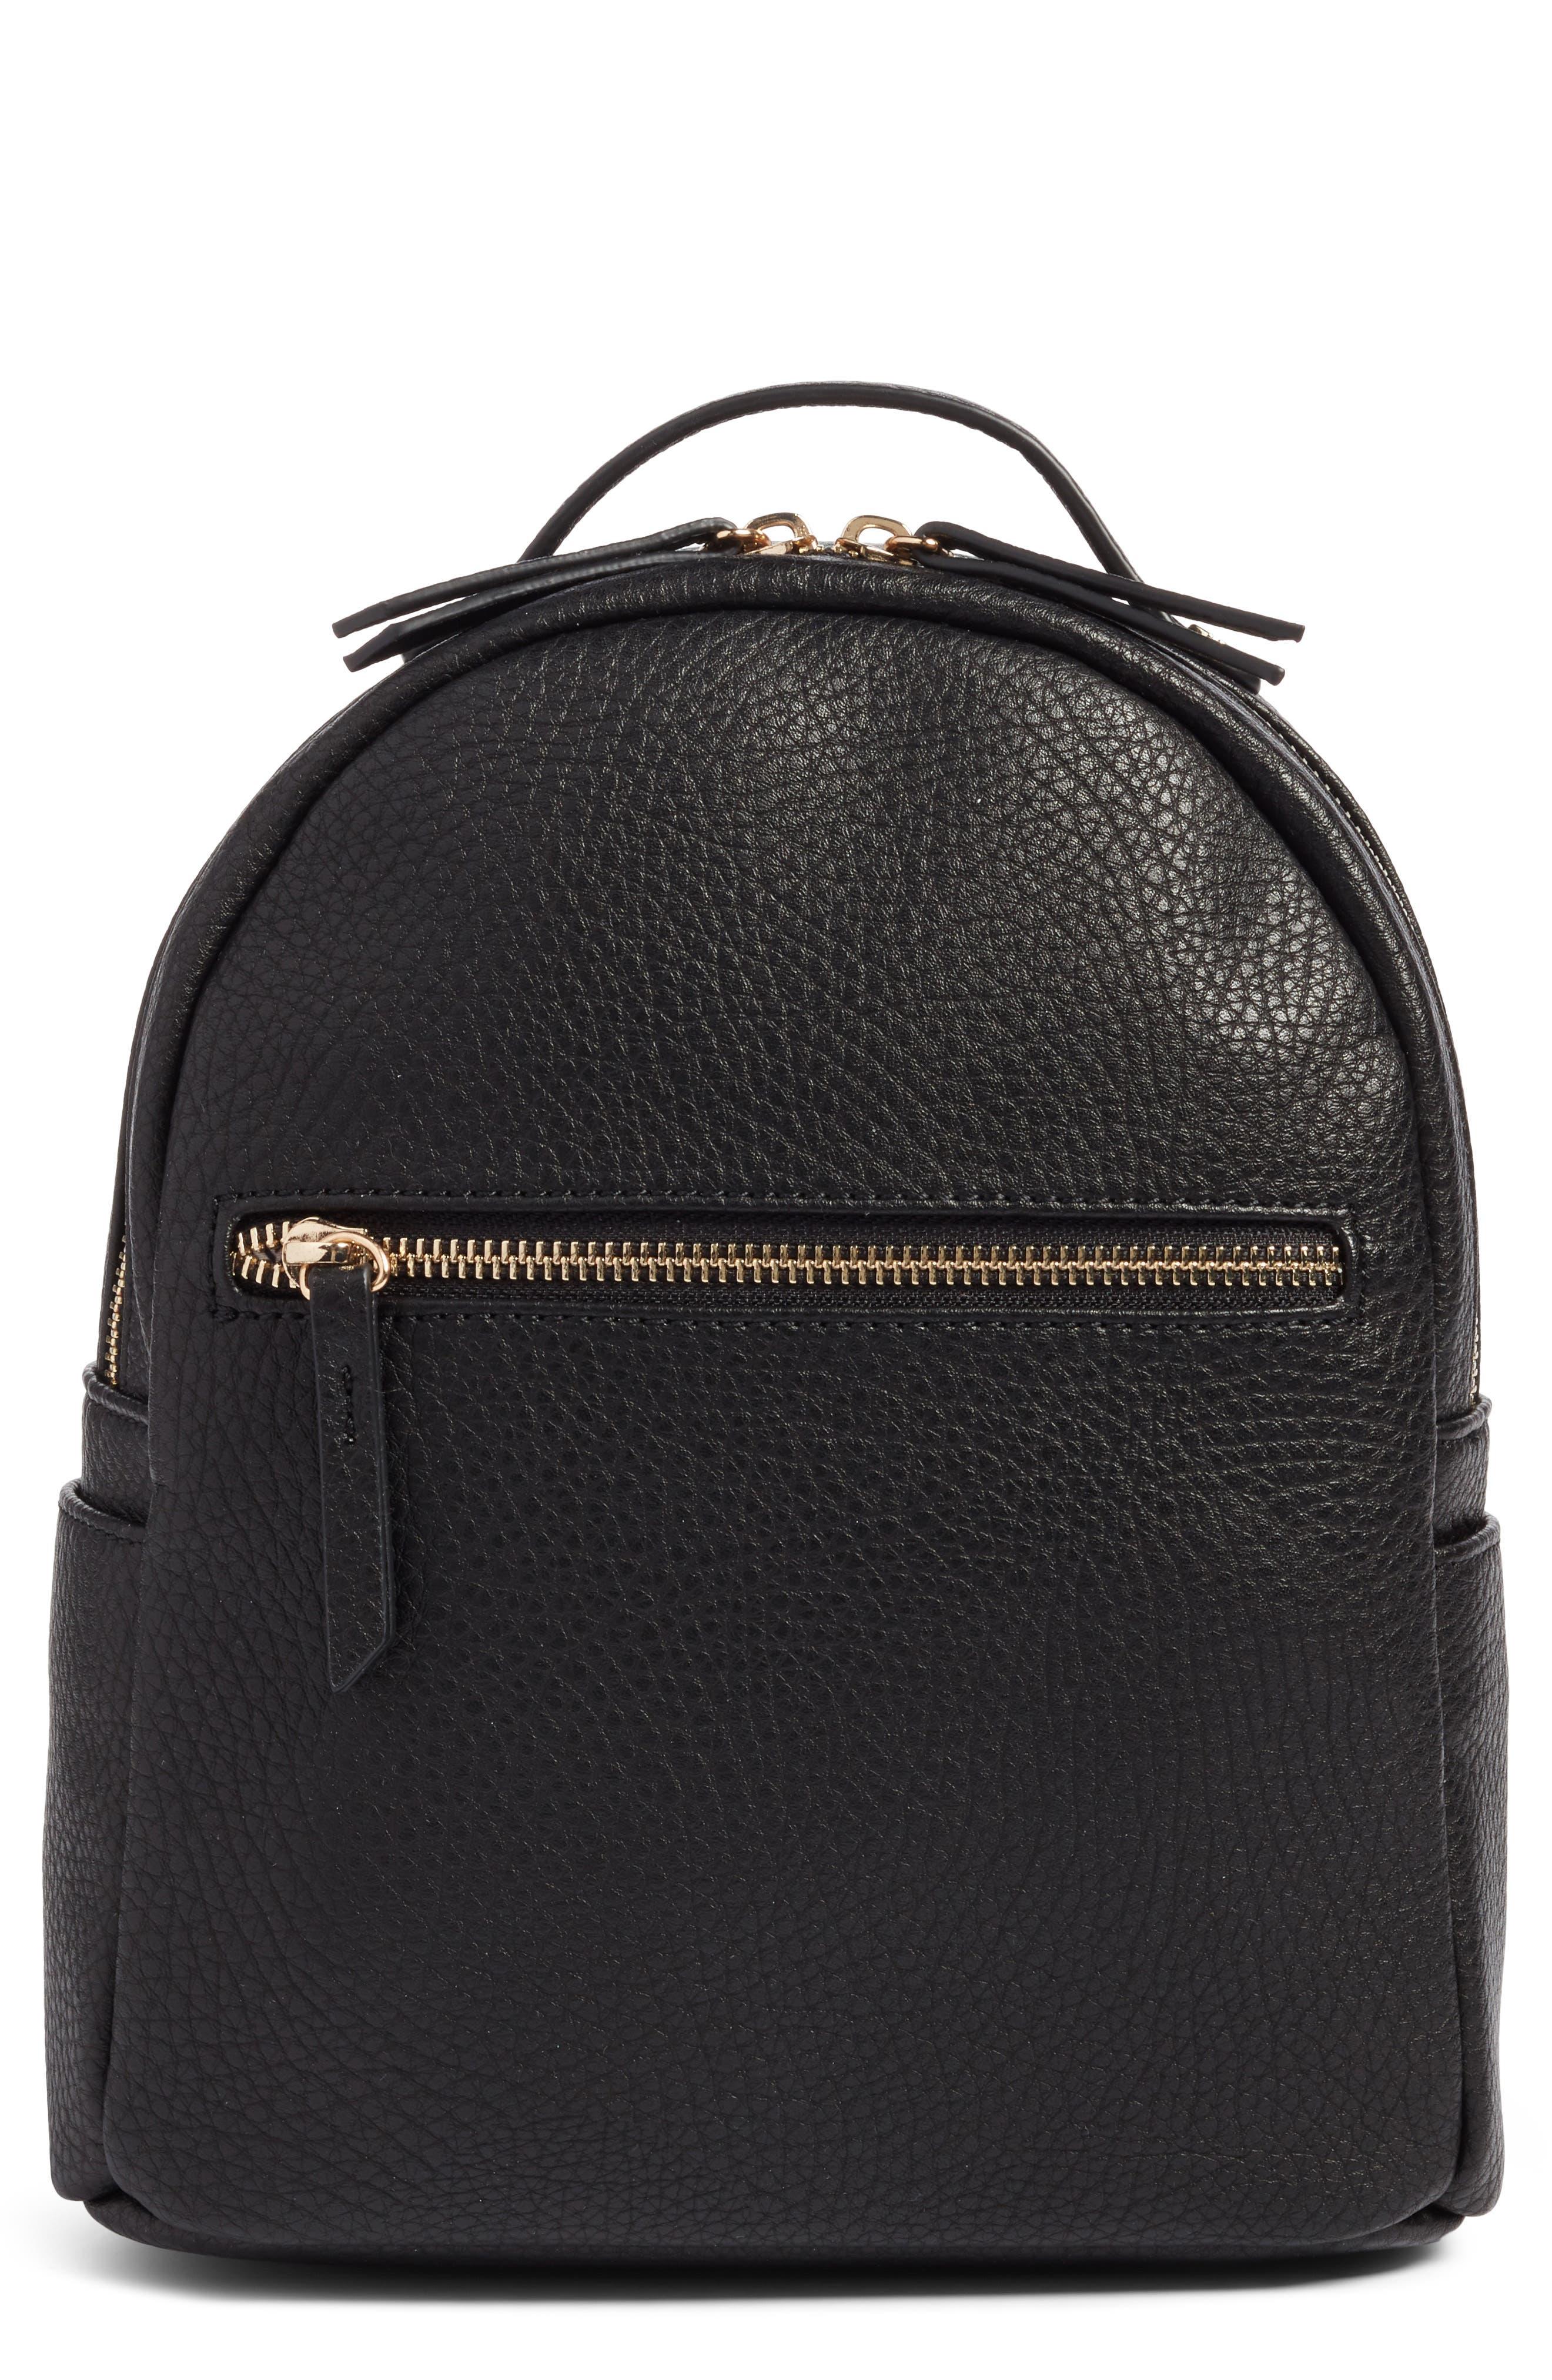 Main Image - Mali + Lili Faux Leather Backpack